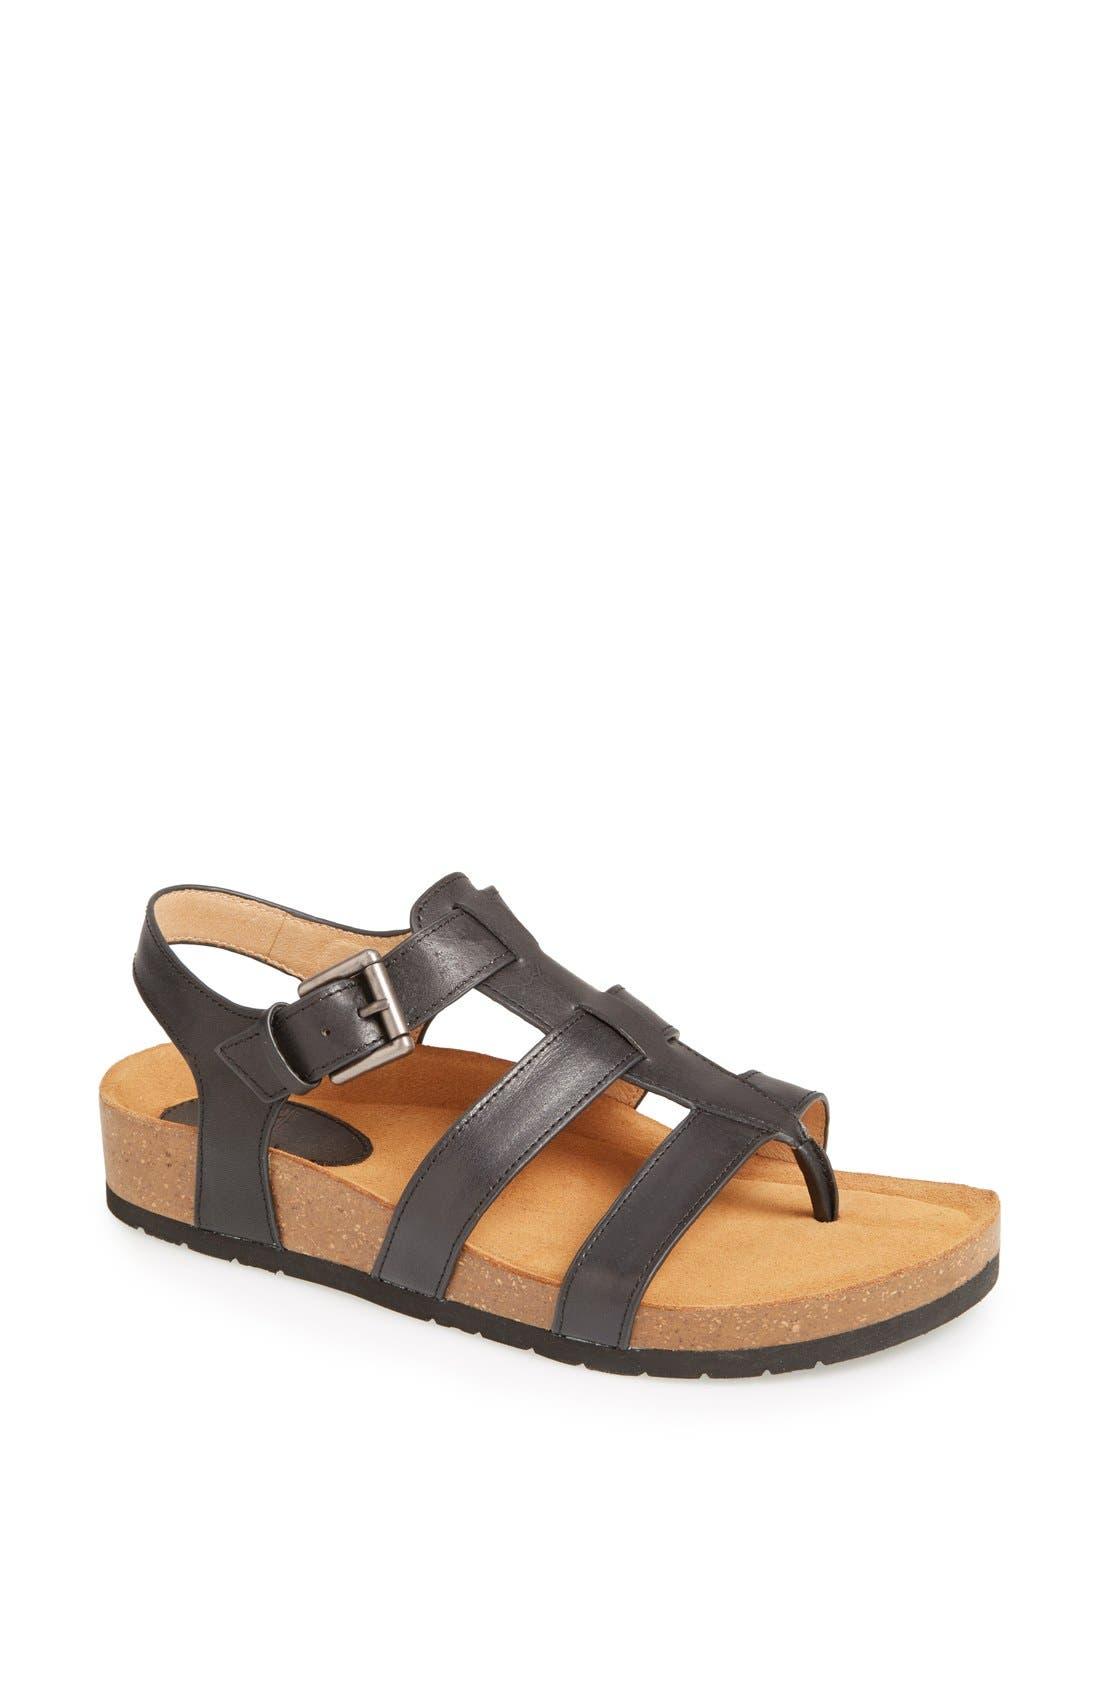 Alternate Image 1 Selected - Söfft 'Burdette' Leather Sandal